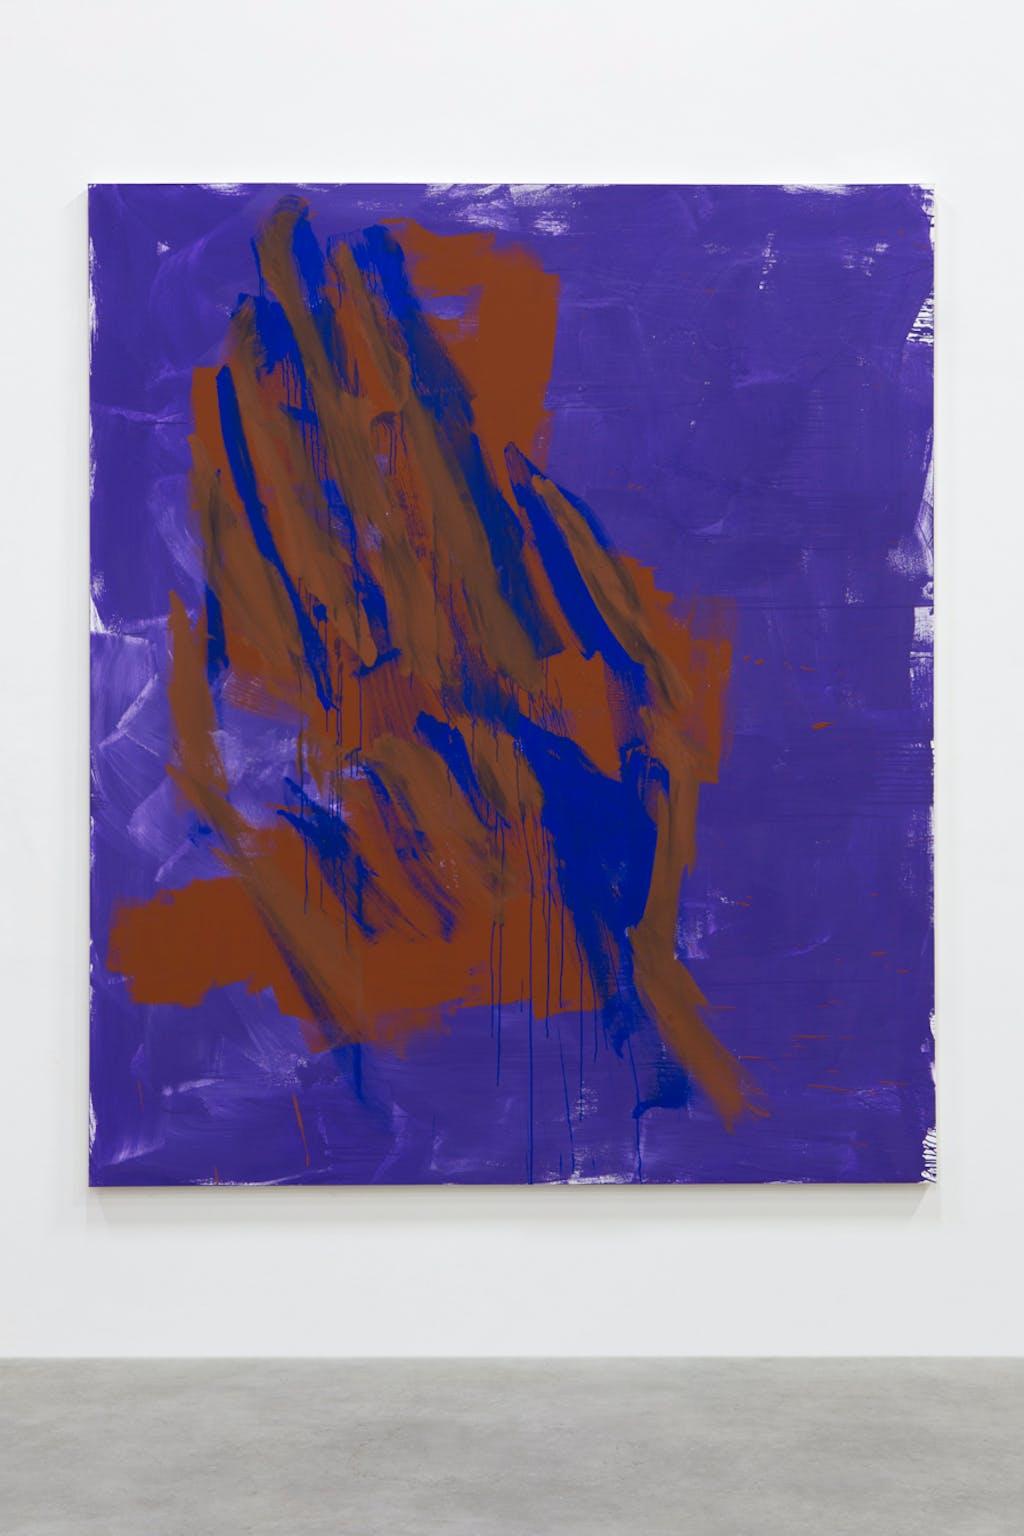 Hands (2) - © kamel mennour